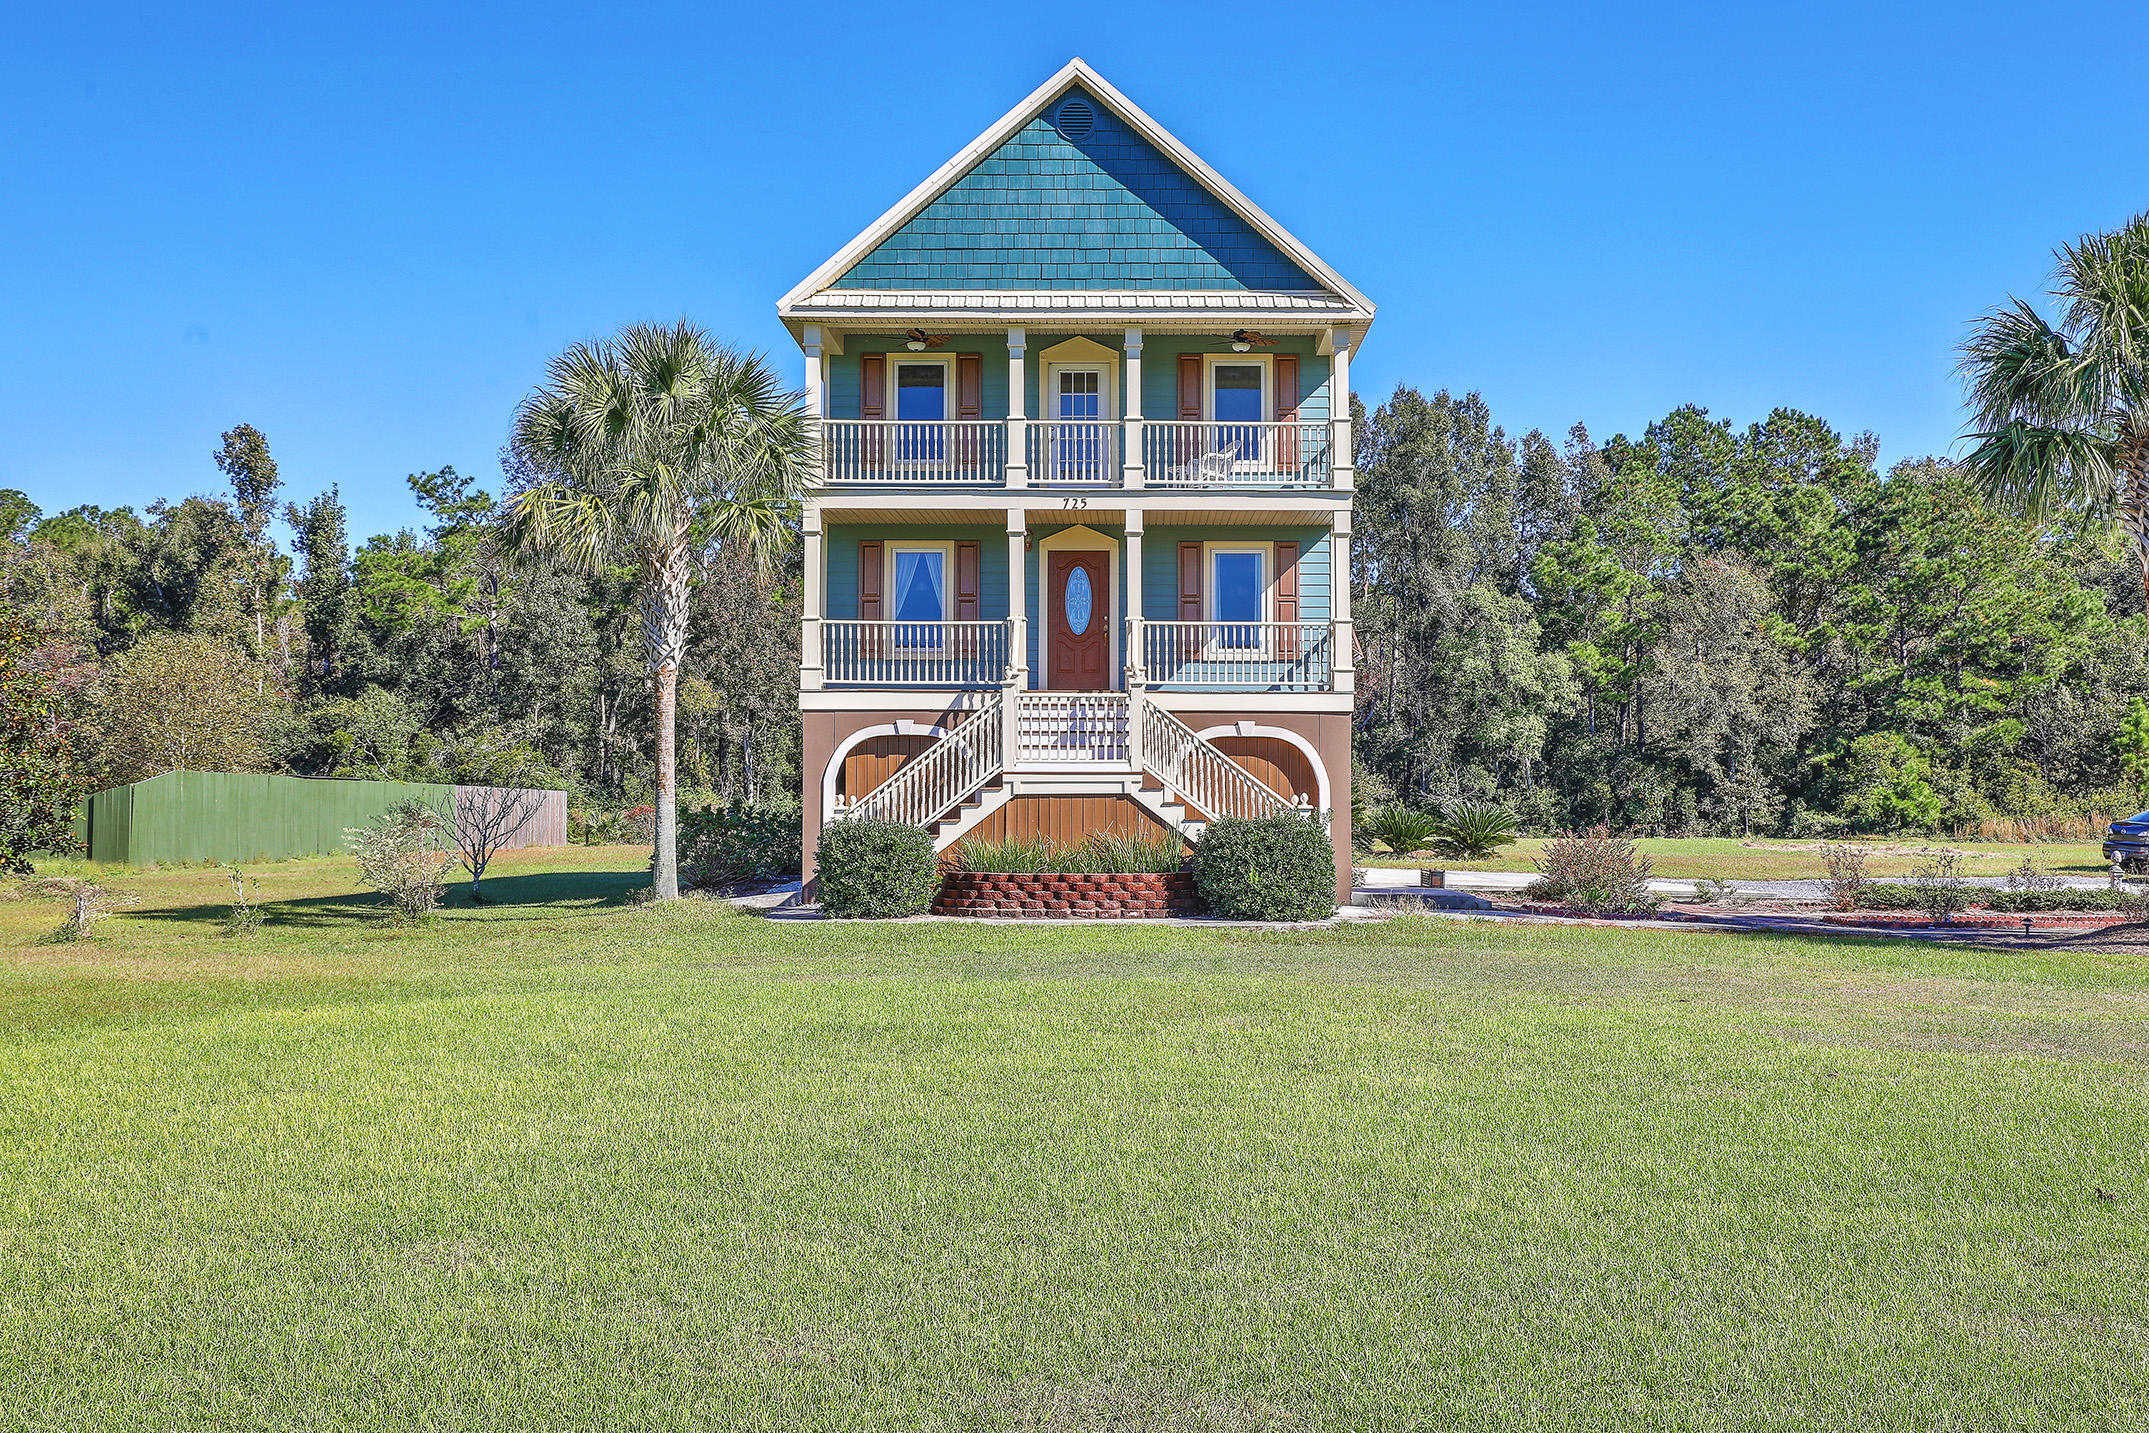 Marshall Creek Homes For Sale - 725 Sonny Boy, Johns Island, SC - 1